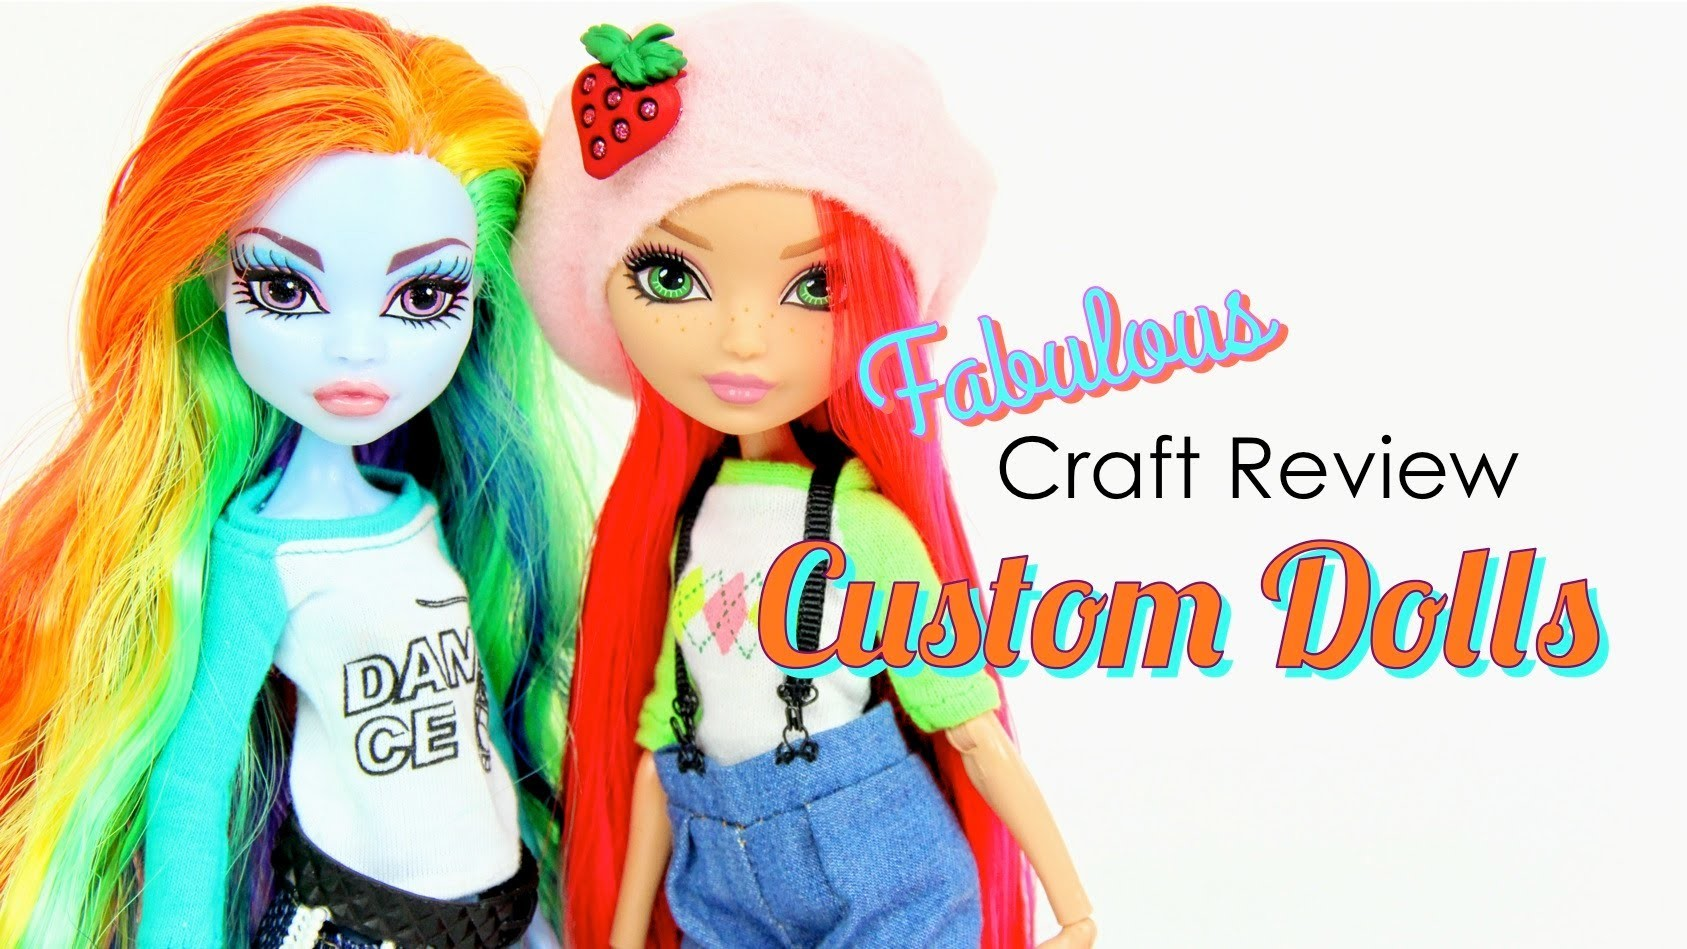 Fabulous Craft Review: Custom Dolls